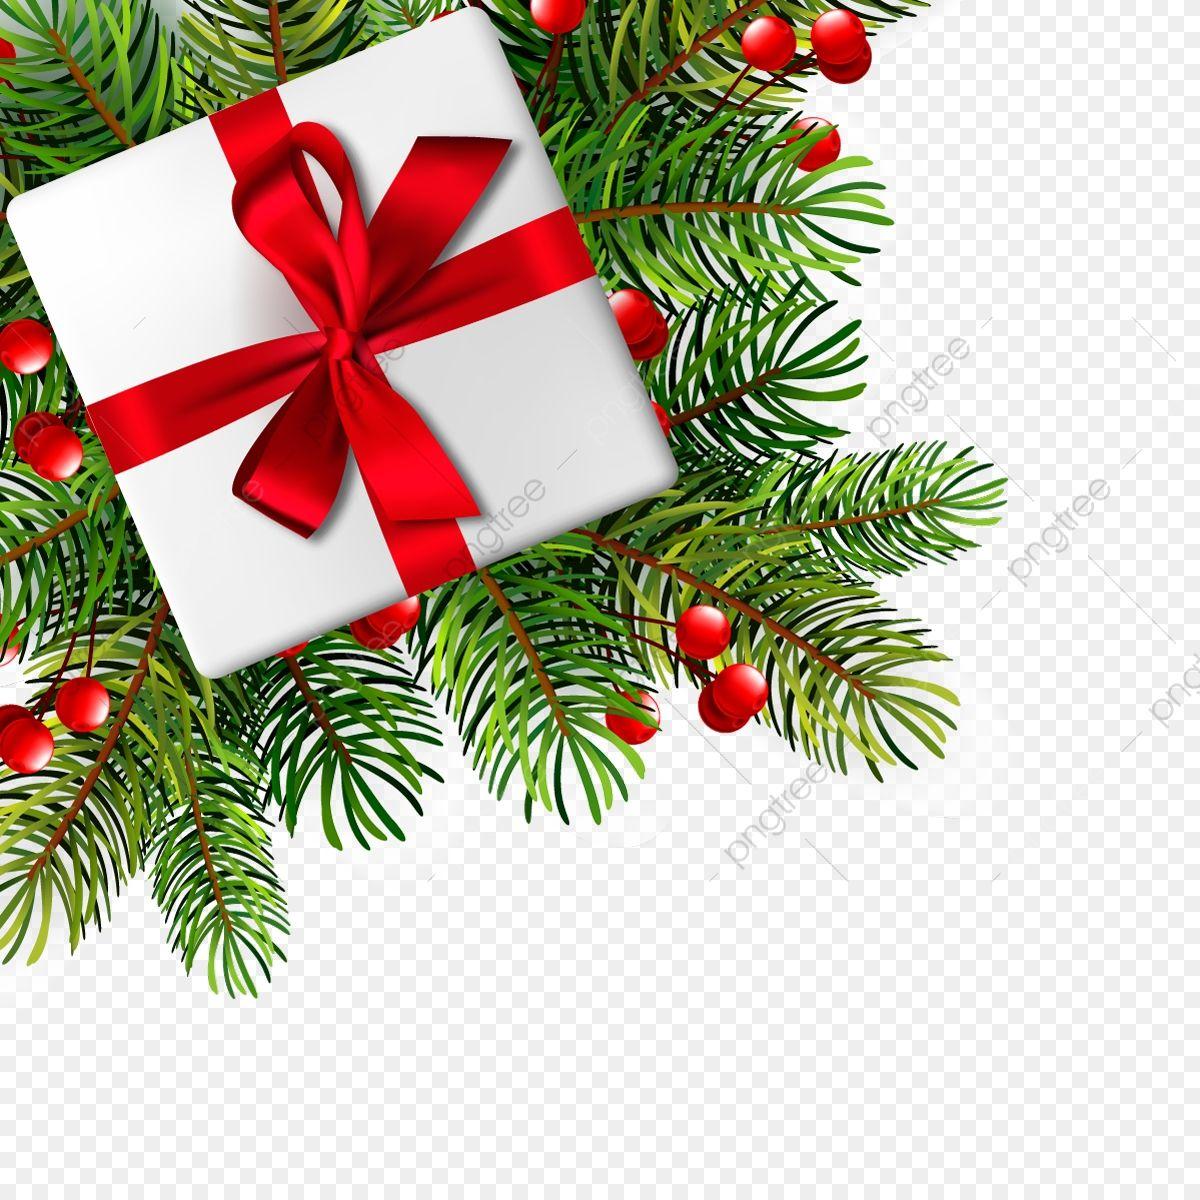 Christmas Illustration With Realistic Fir Branches Vector Illustration Christmas Gift Merry Chris In 2020 Christmas Illustration Branch Vector Merry Christmas Vector